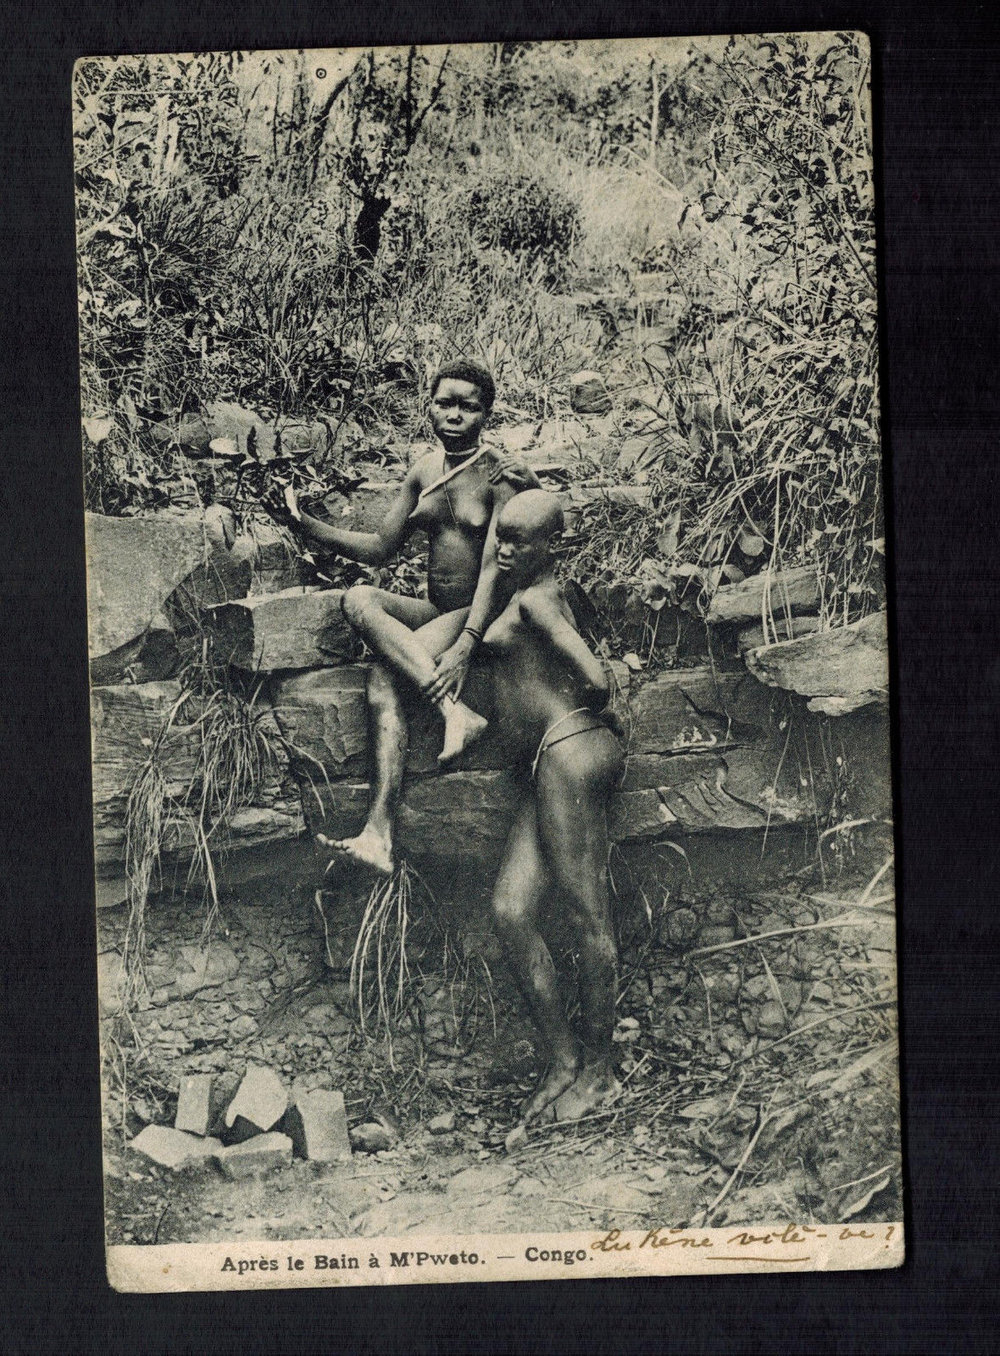 NUDE CONGO TWO.jpg